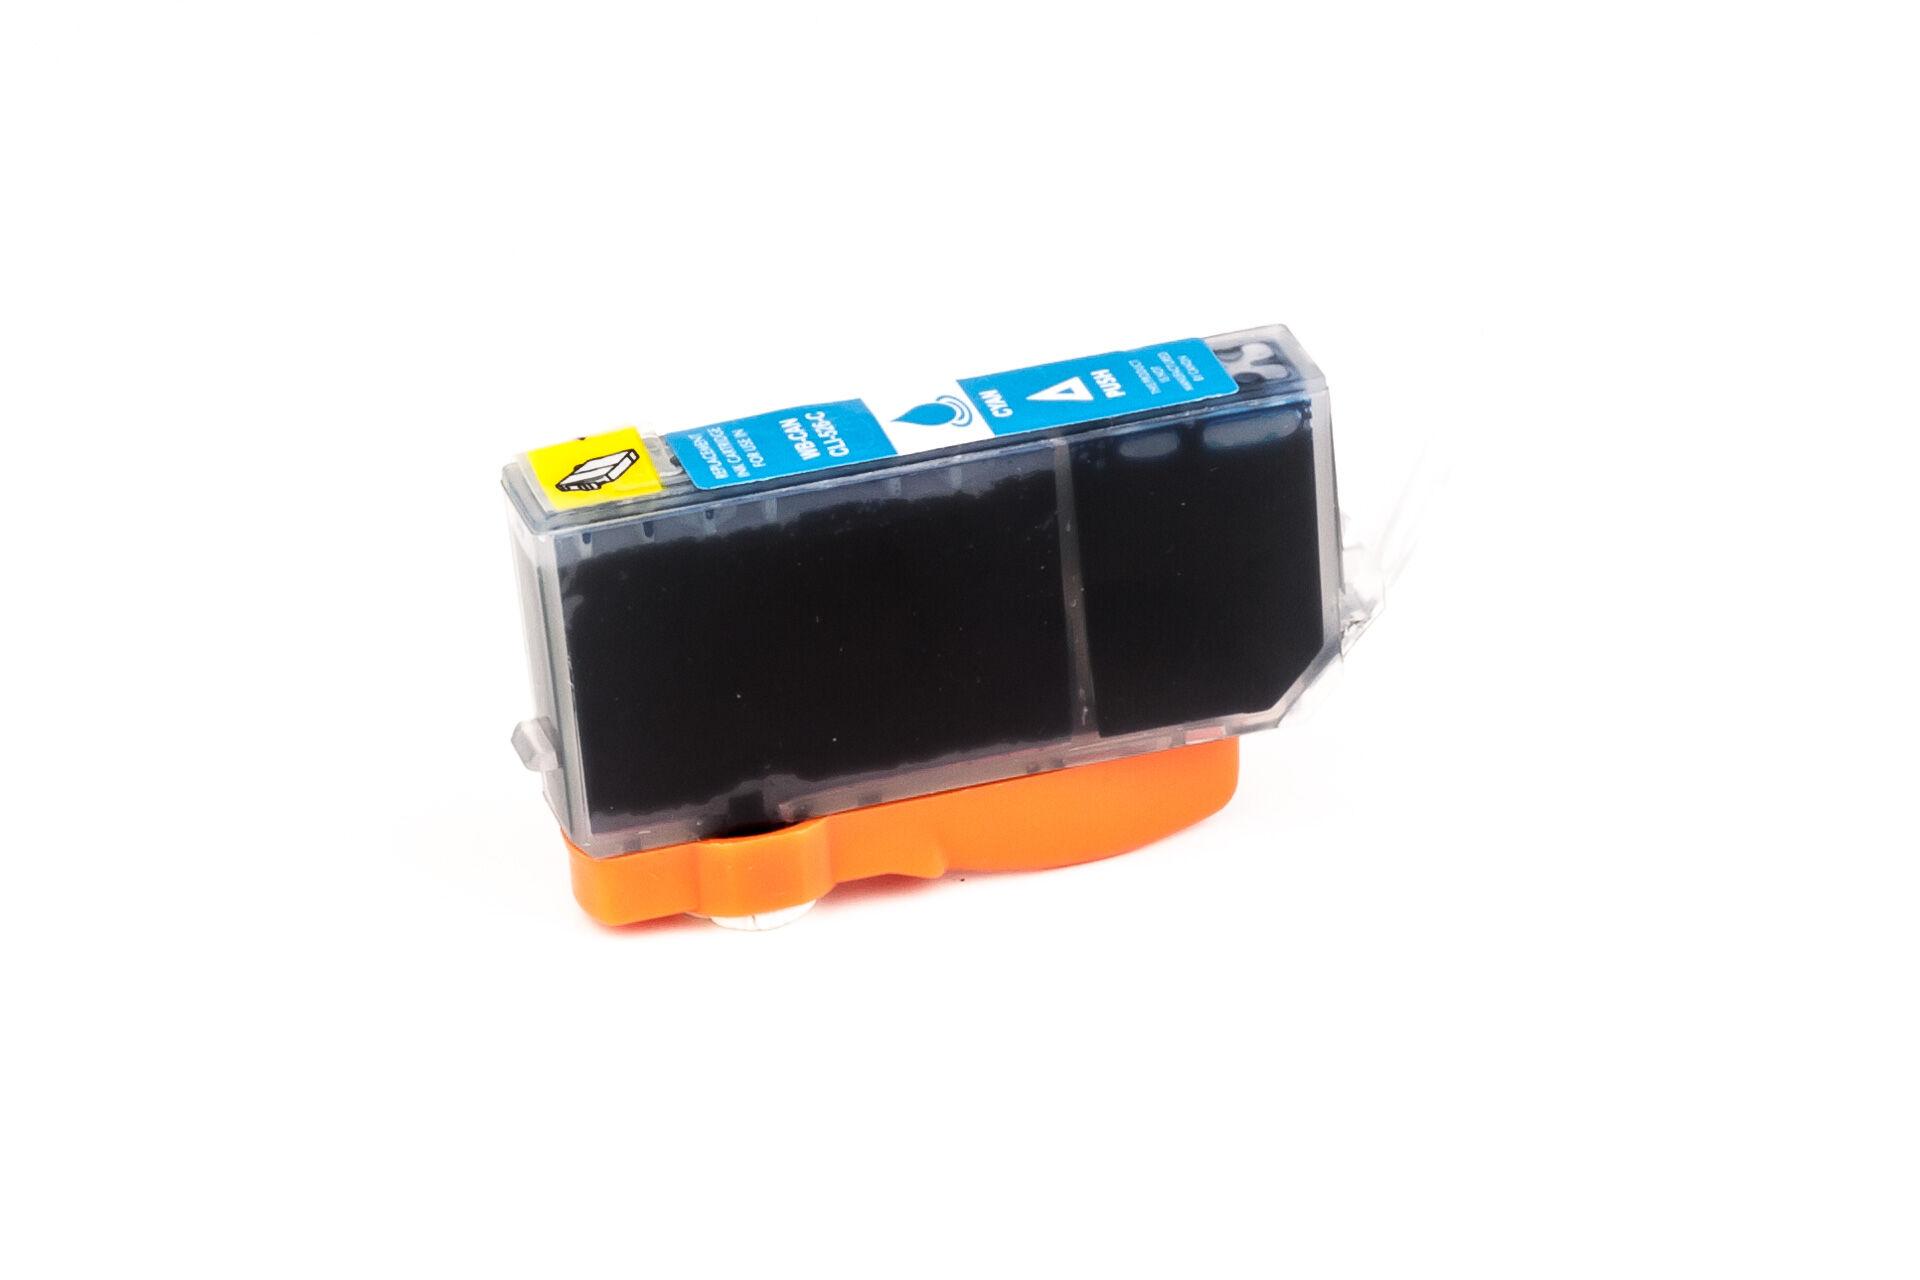 Canon Cartouche d'encre pour Canon 4541B001 / CLI-526 C cyan compatible (de marque ASC)